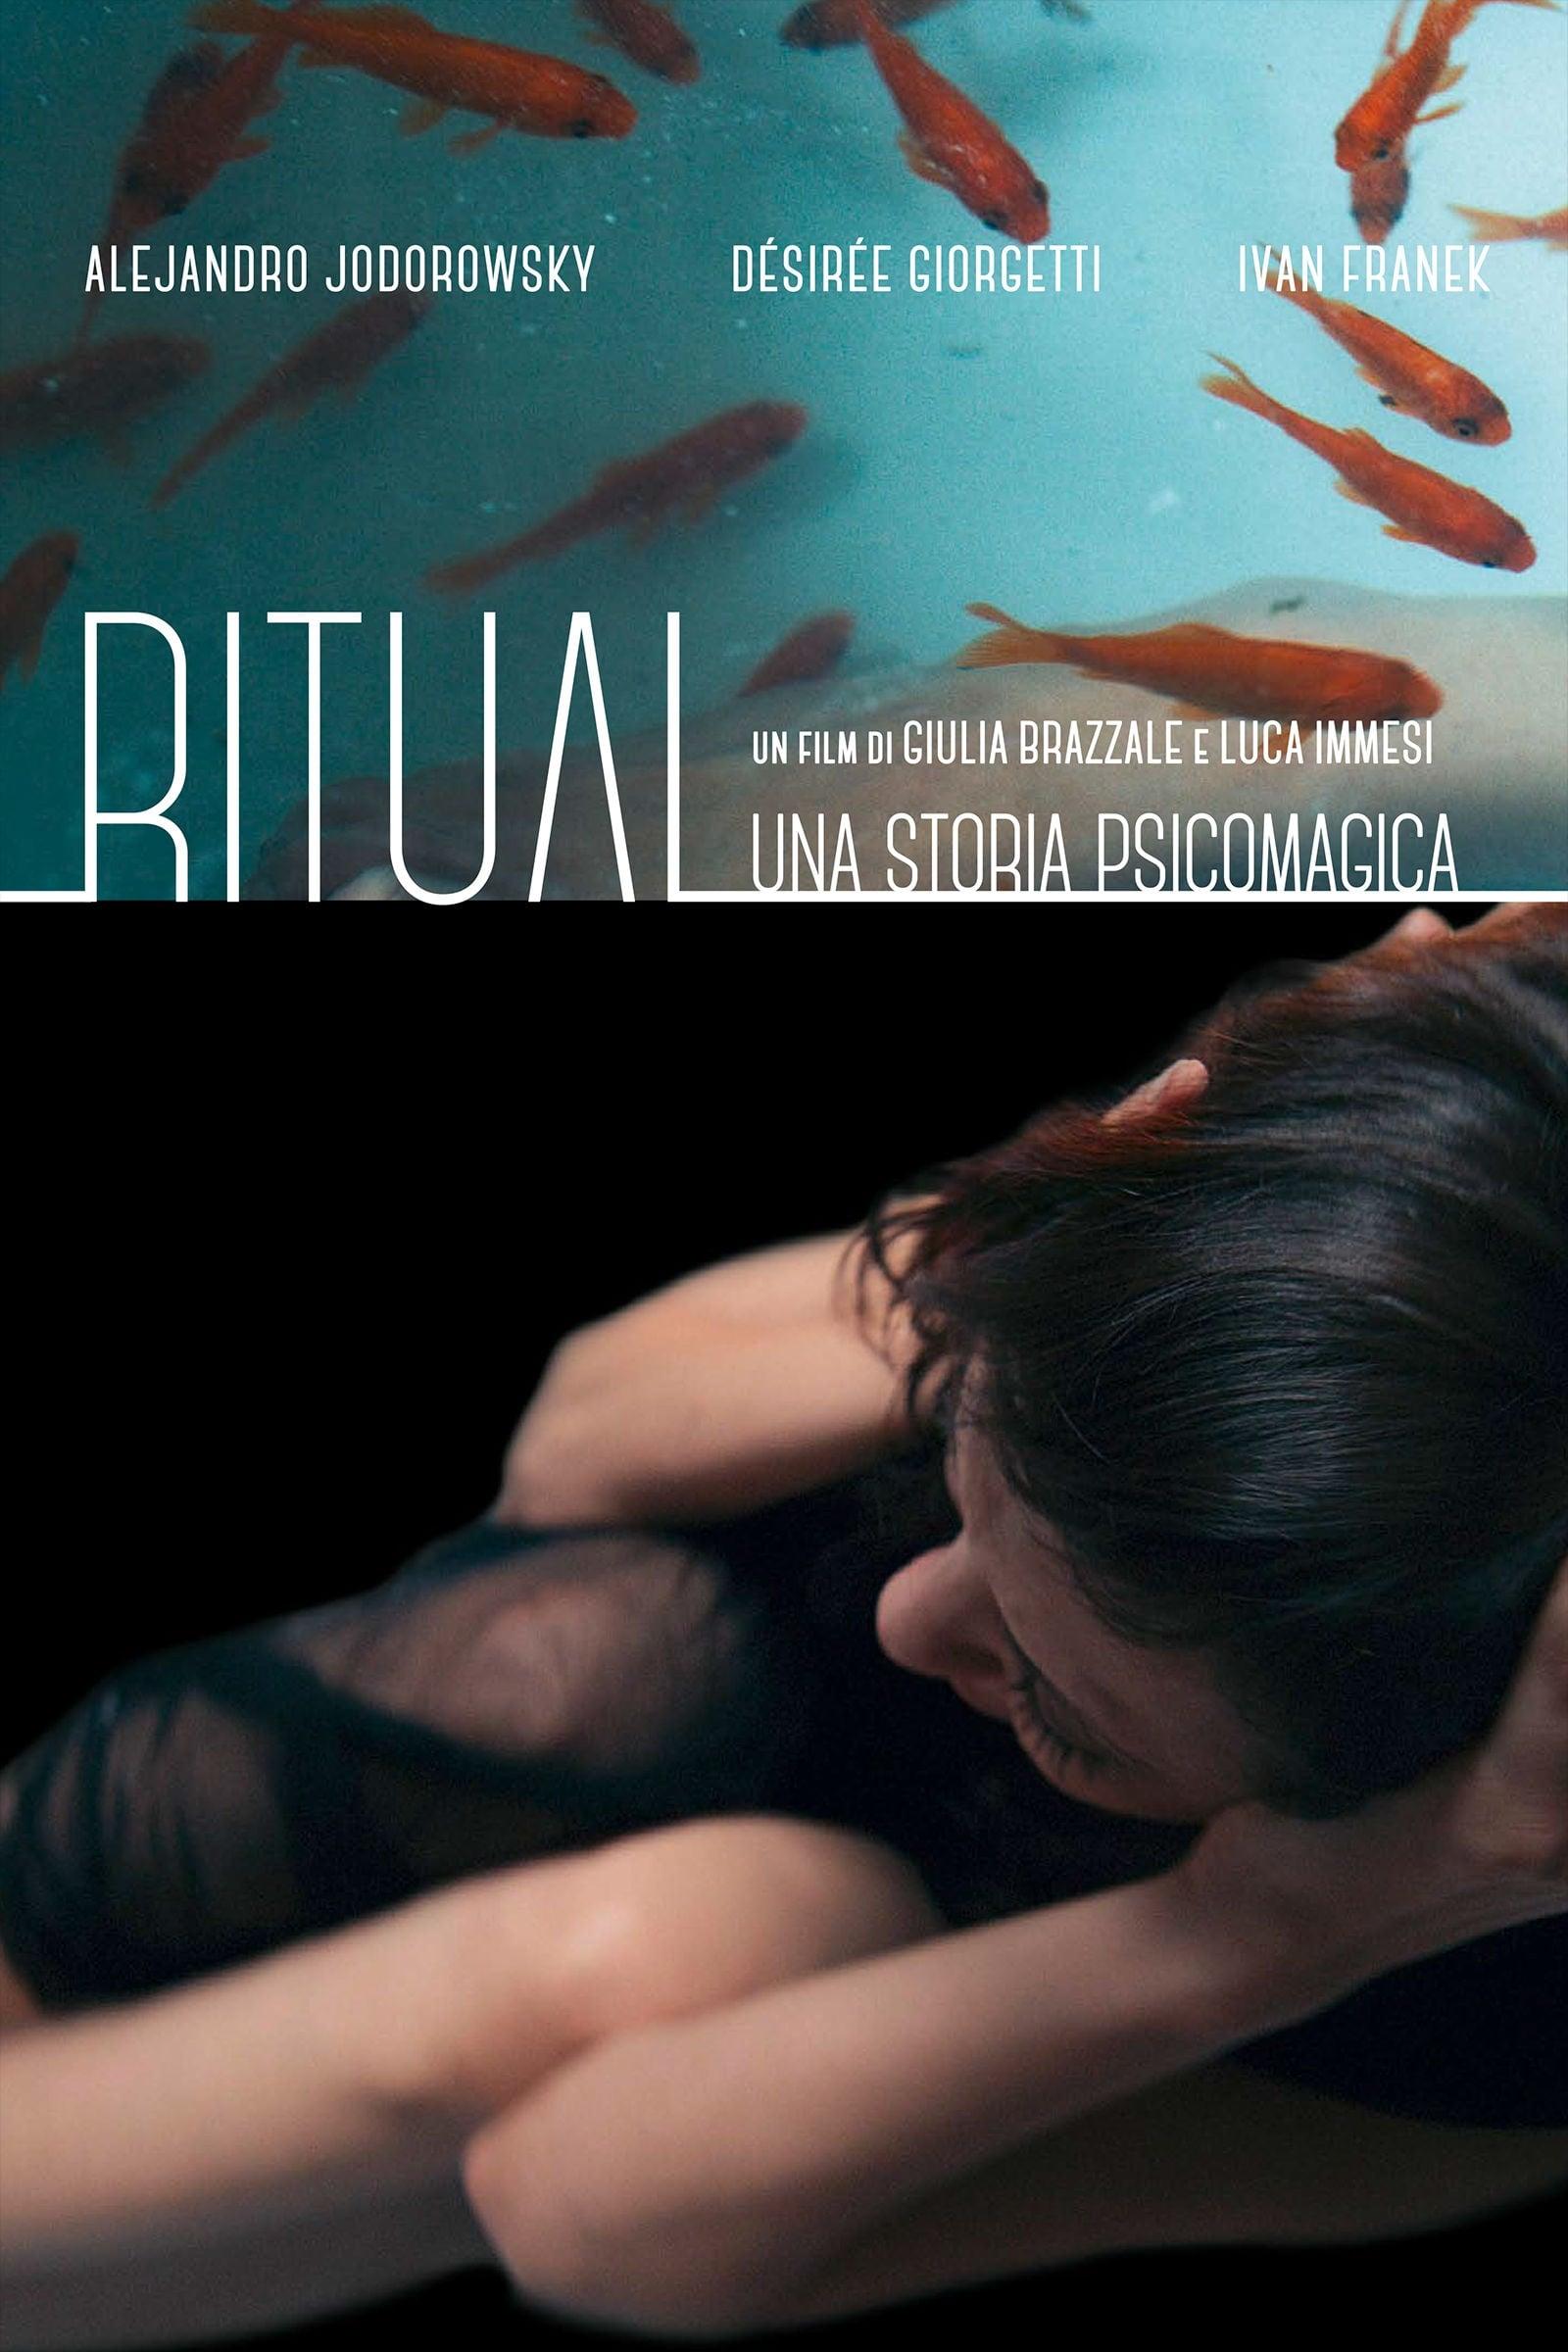 Ritual - A Psychomagic Story (2013)